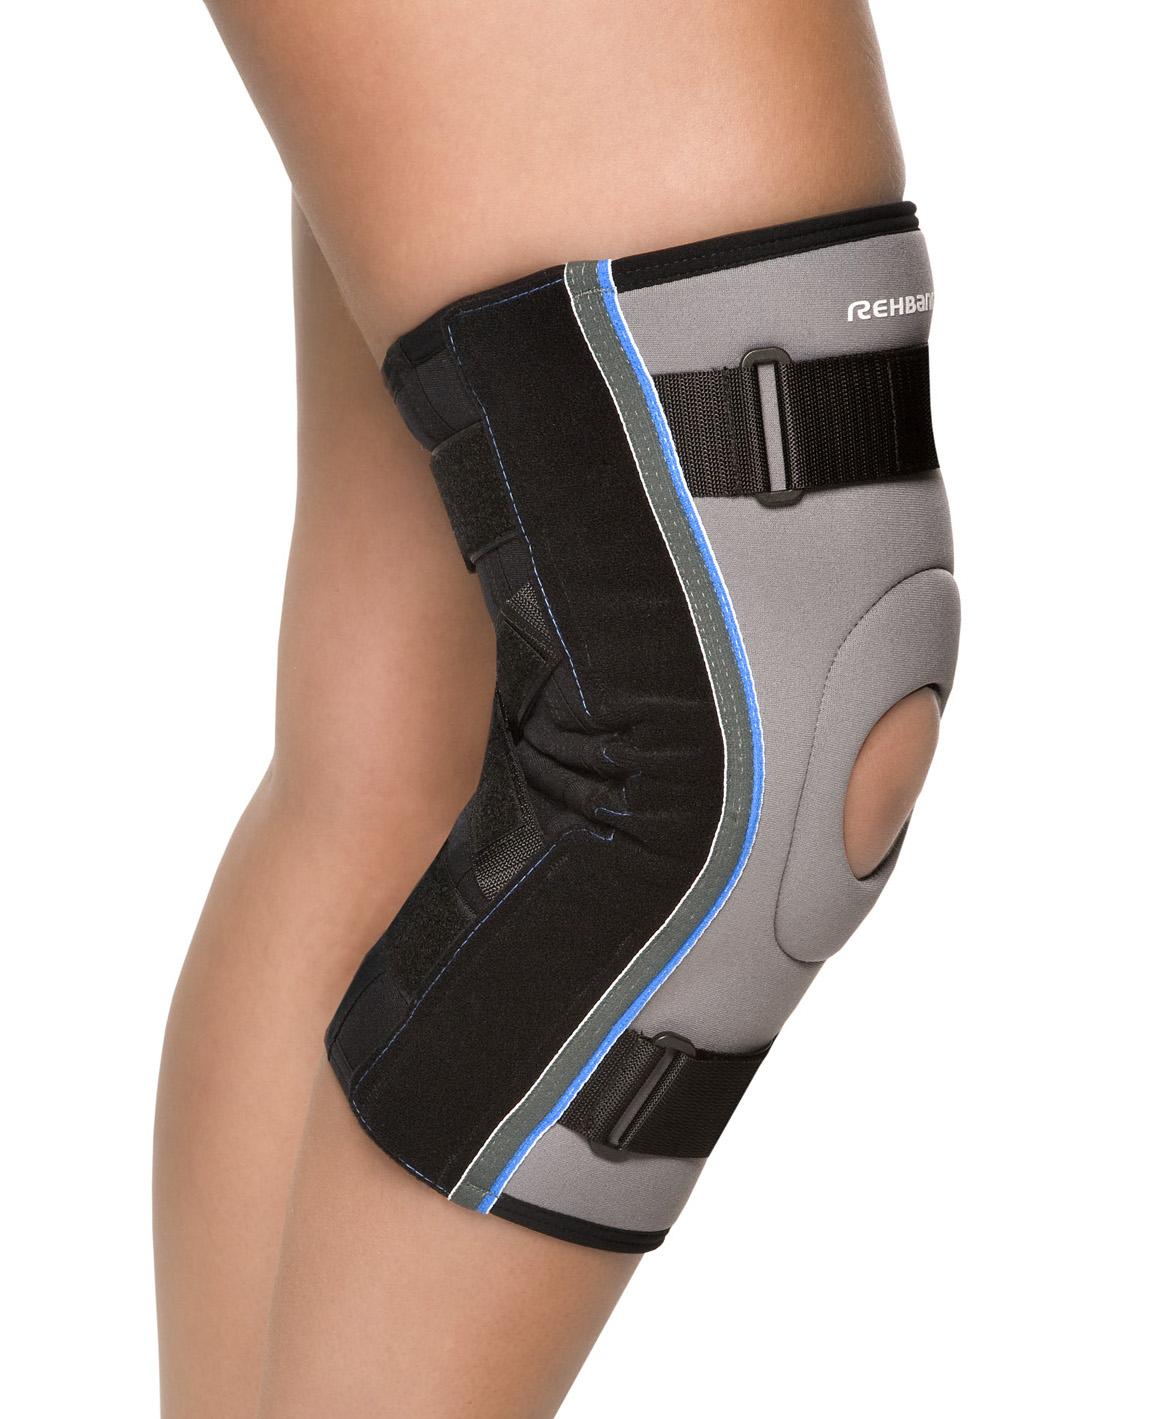 Hyper X Knee Support Knieschtzer Protektoren Rehband Shop